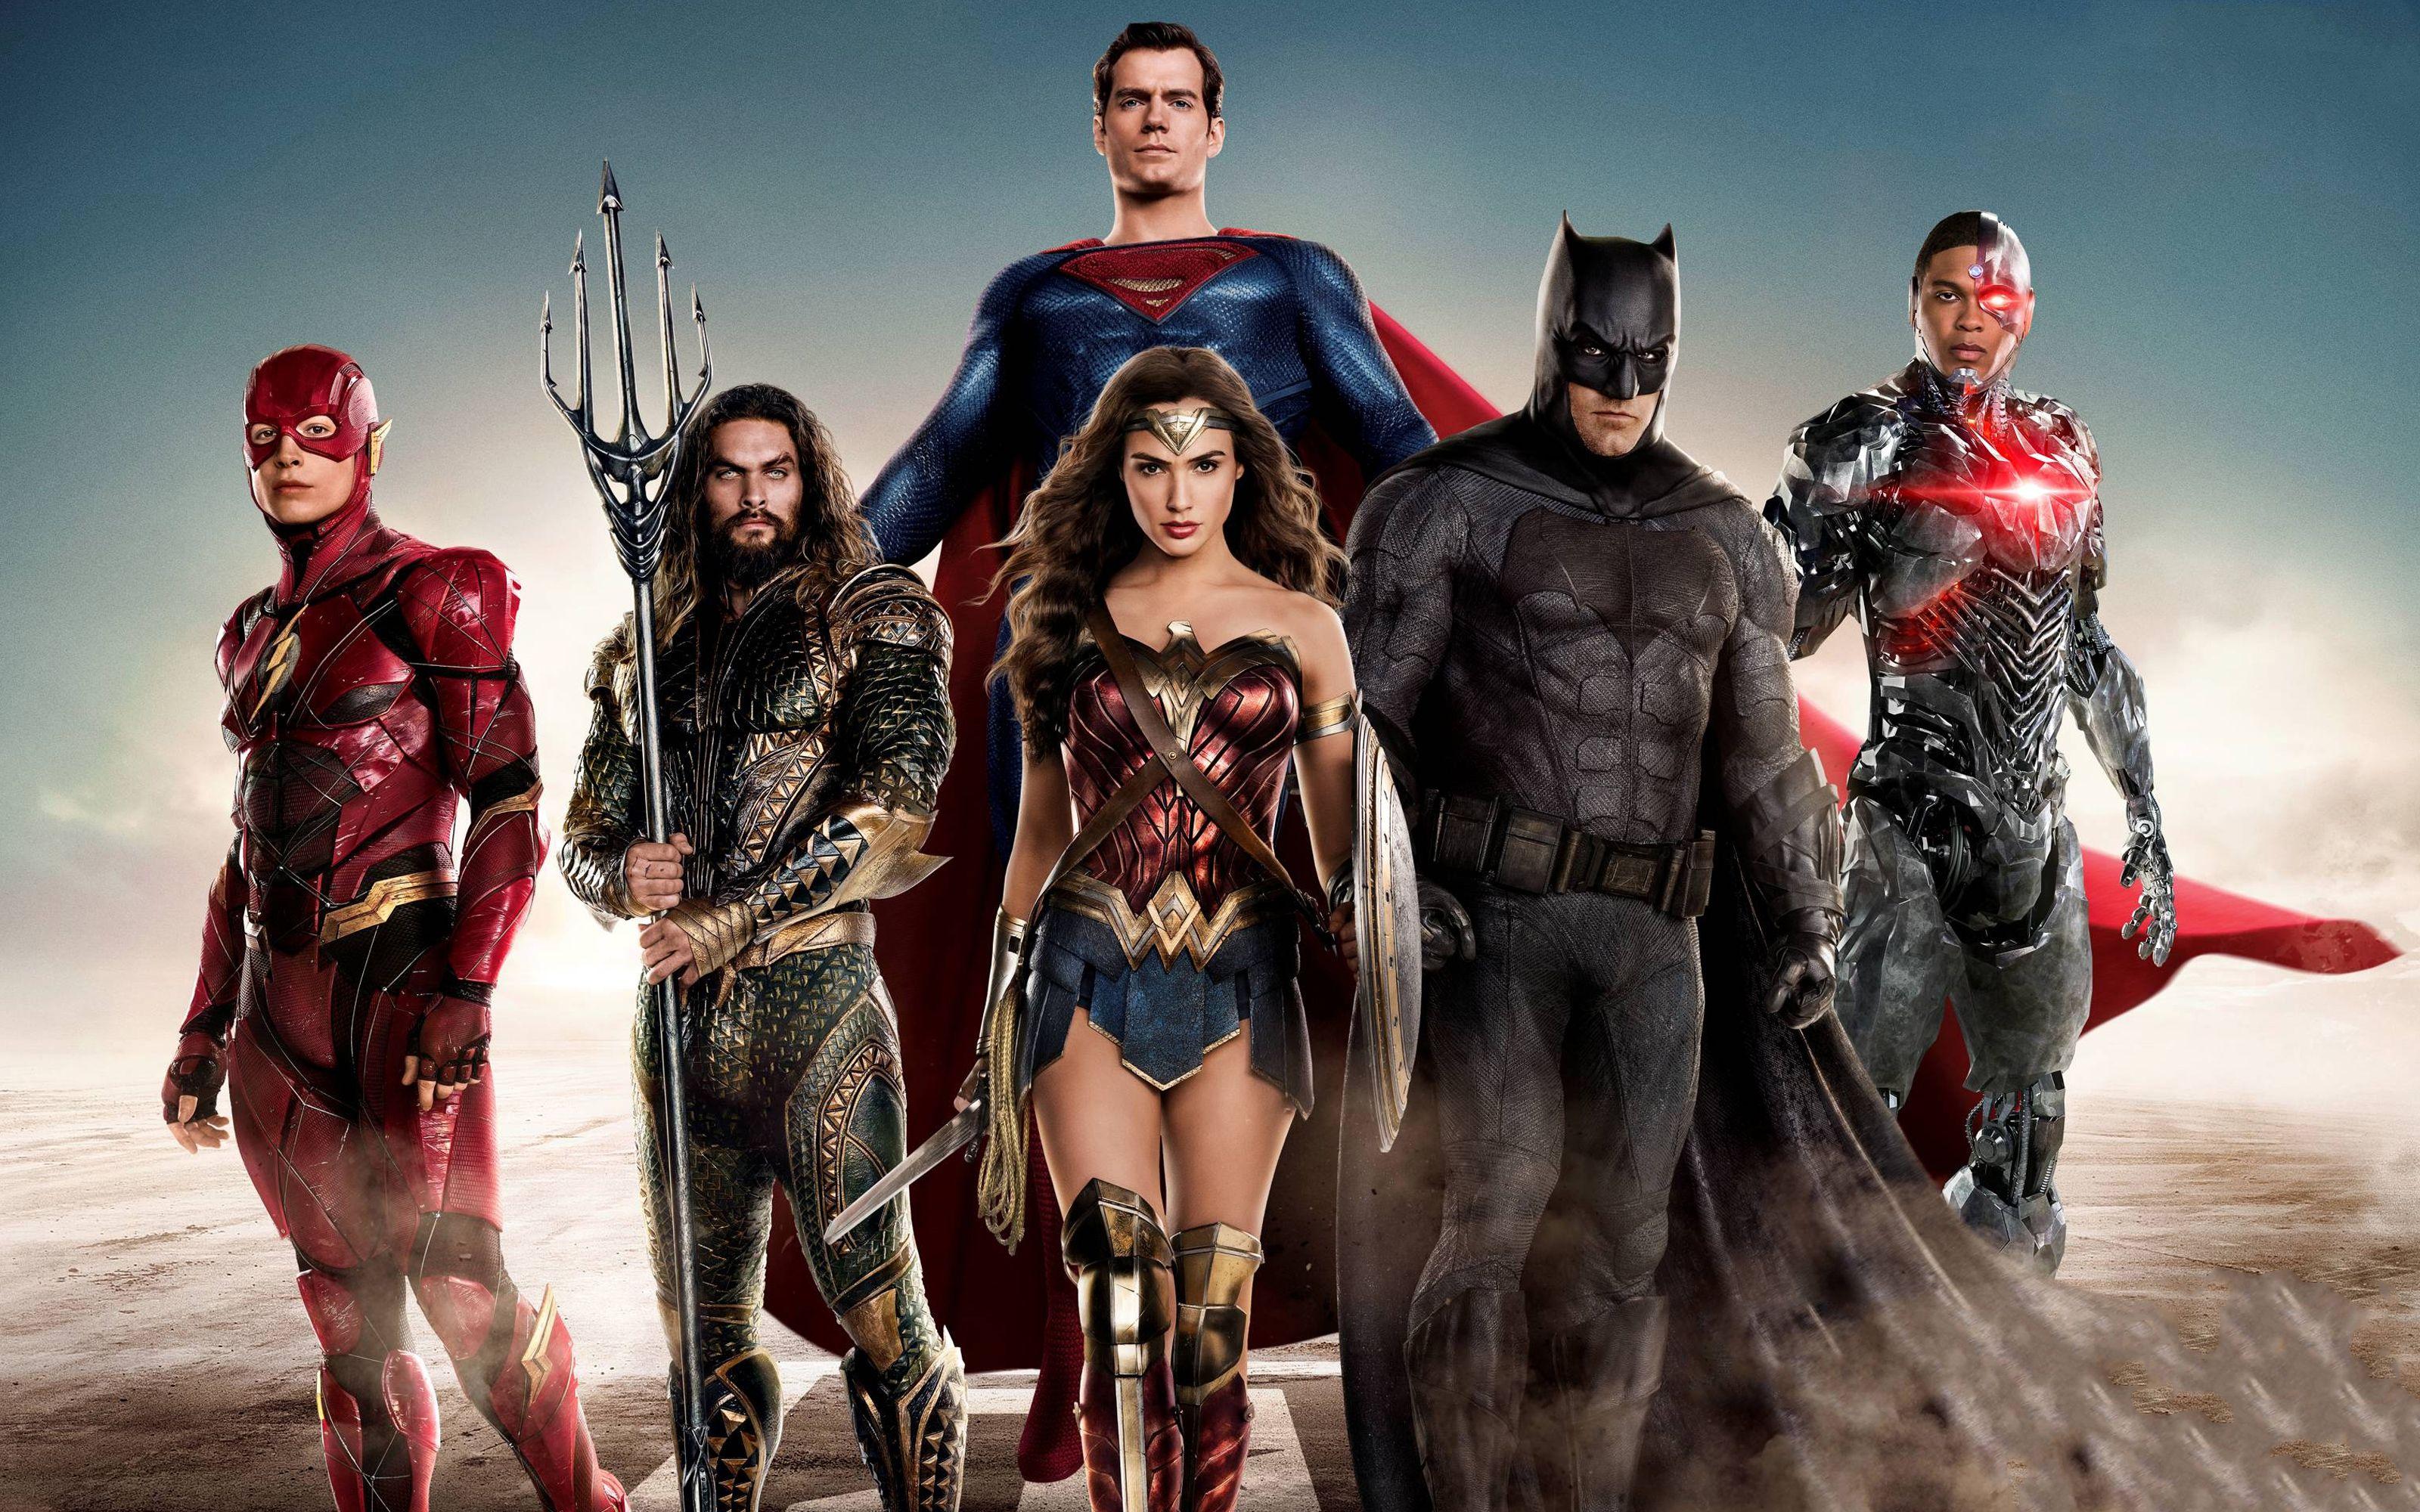 Justice League Dc Comics Superheroes Justice League Superheroes Comic Movies Dc Comics Superheroes